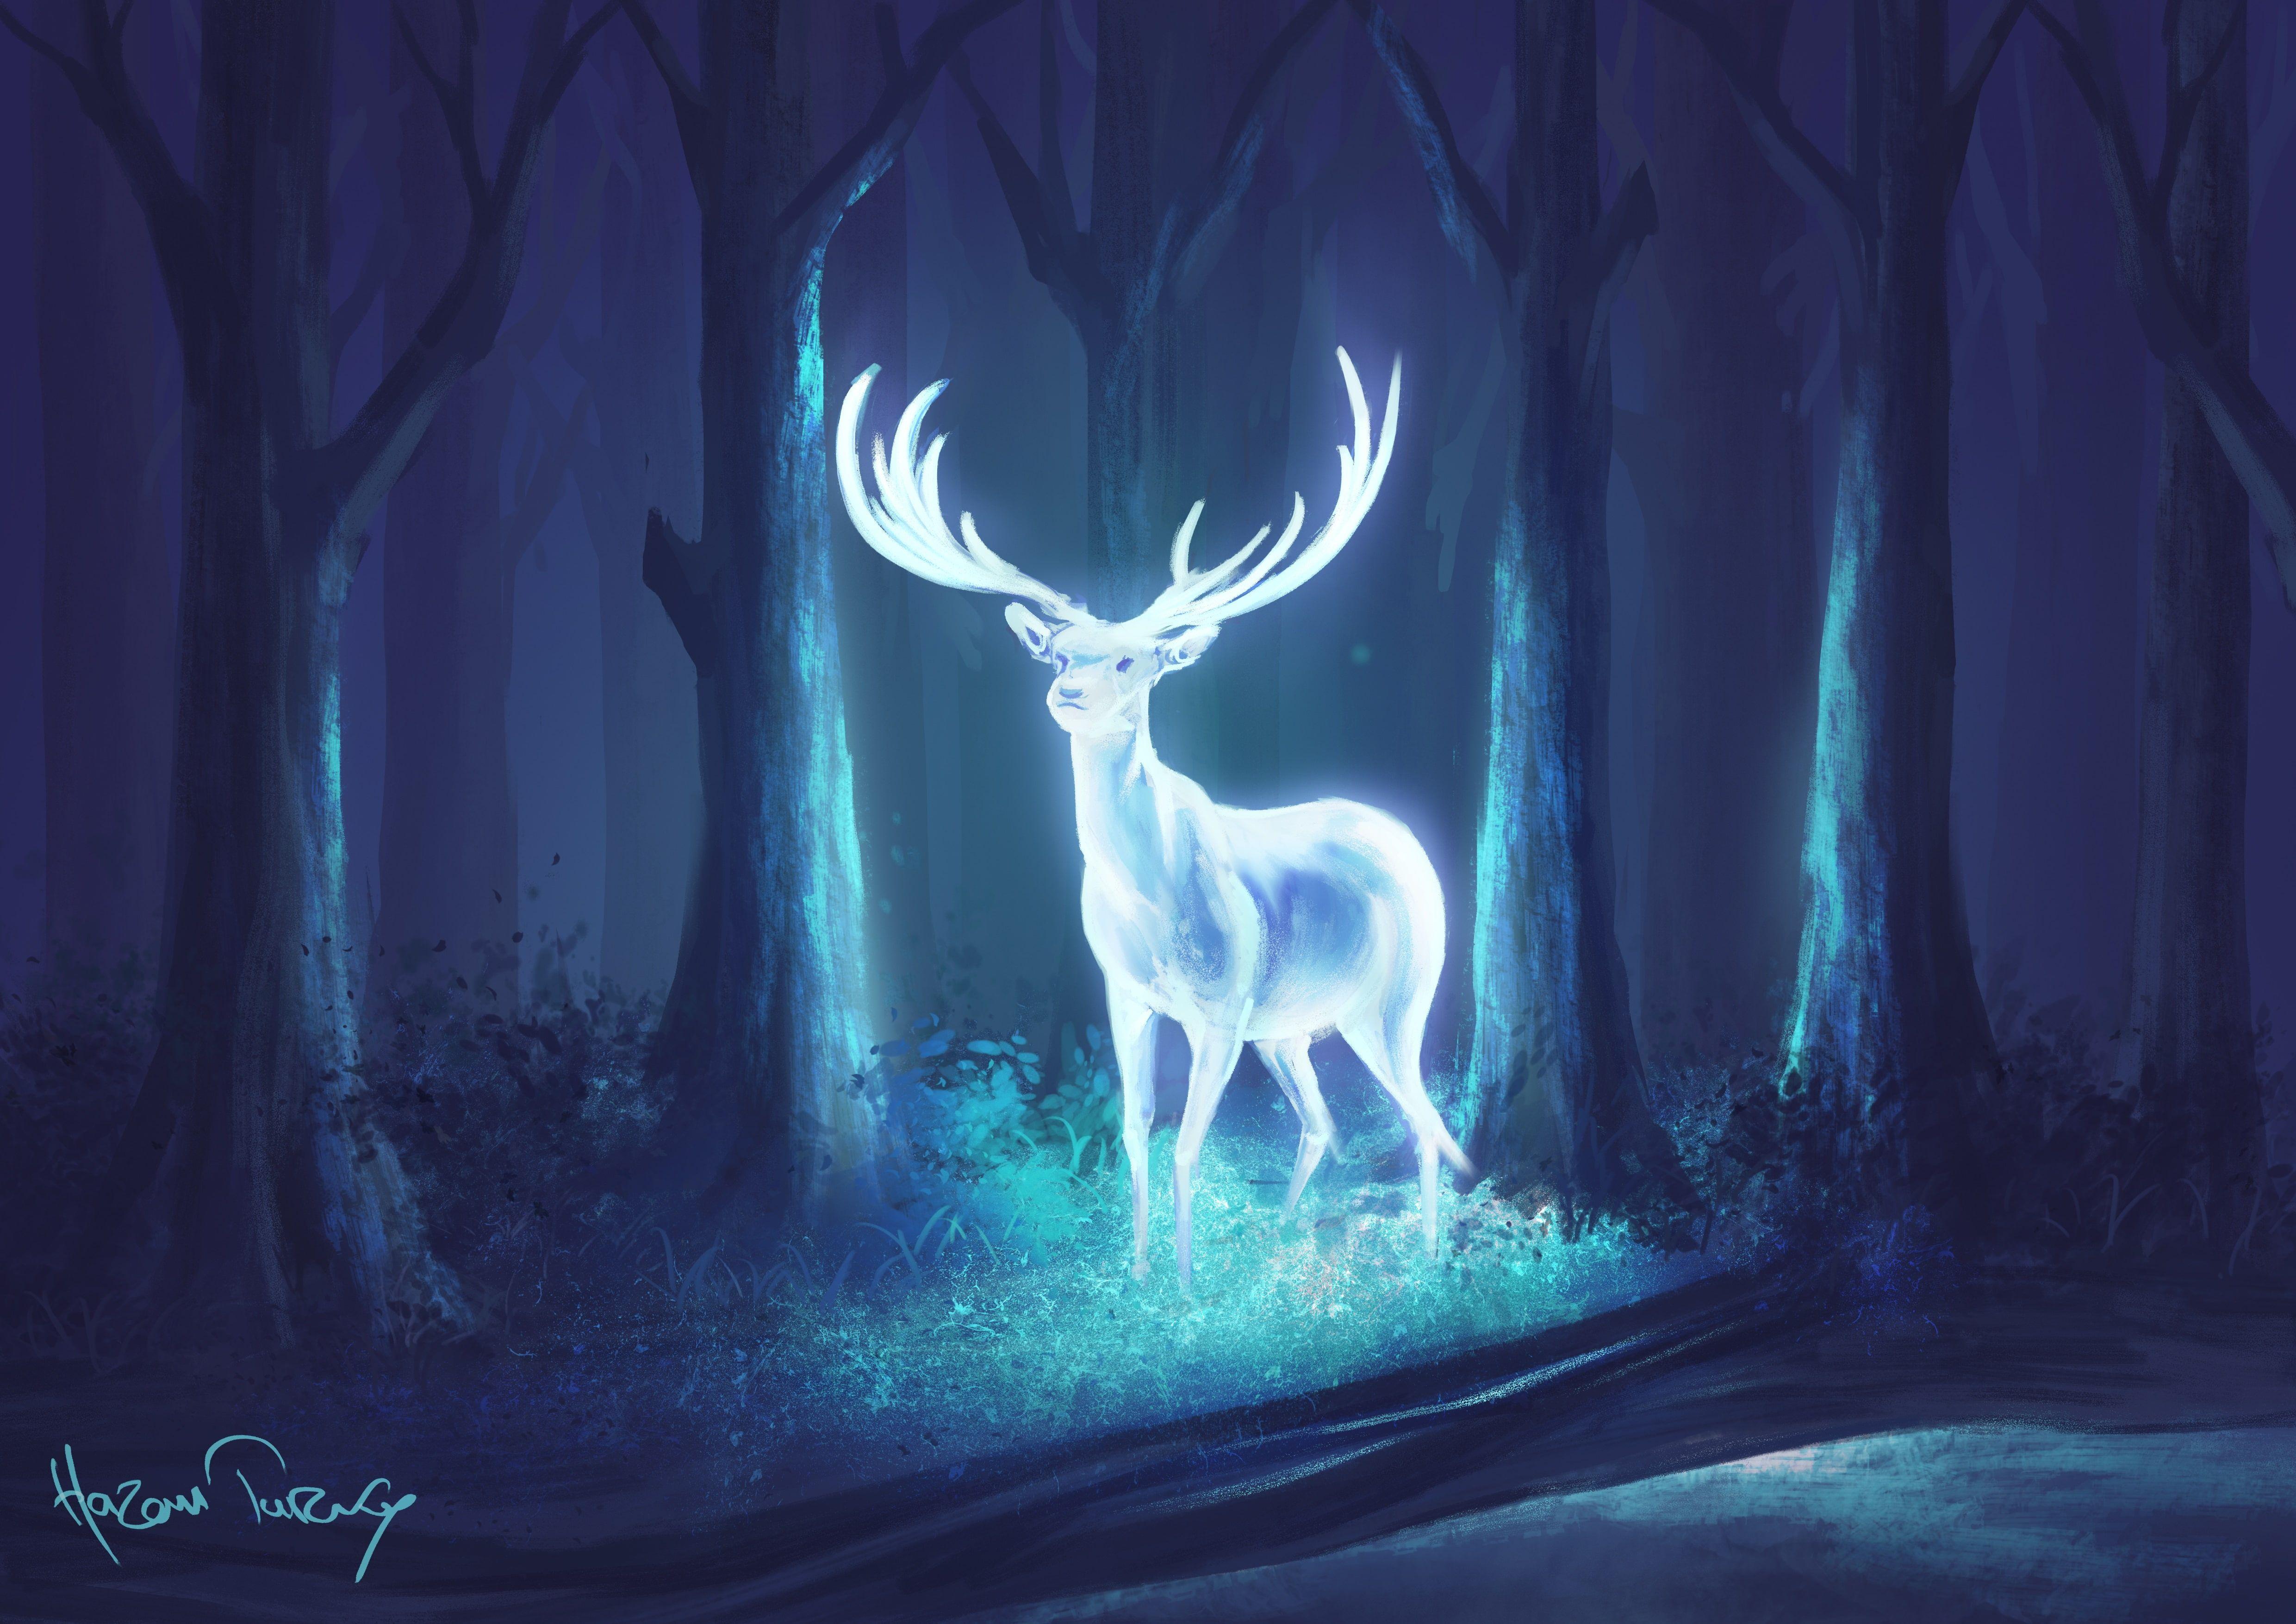 digital art deer forest neon fantasy art blue 4K